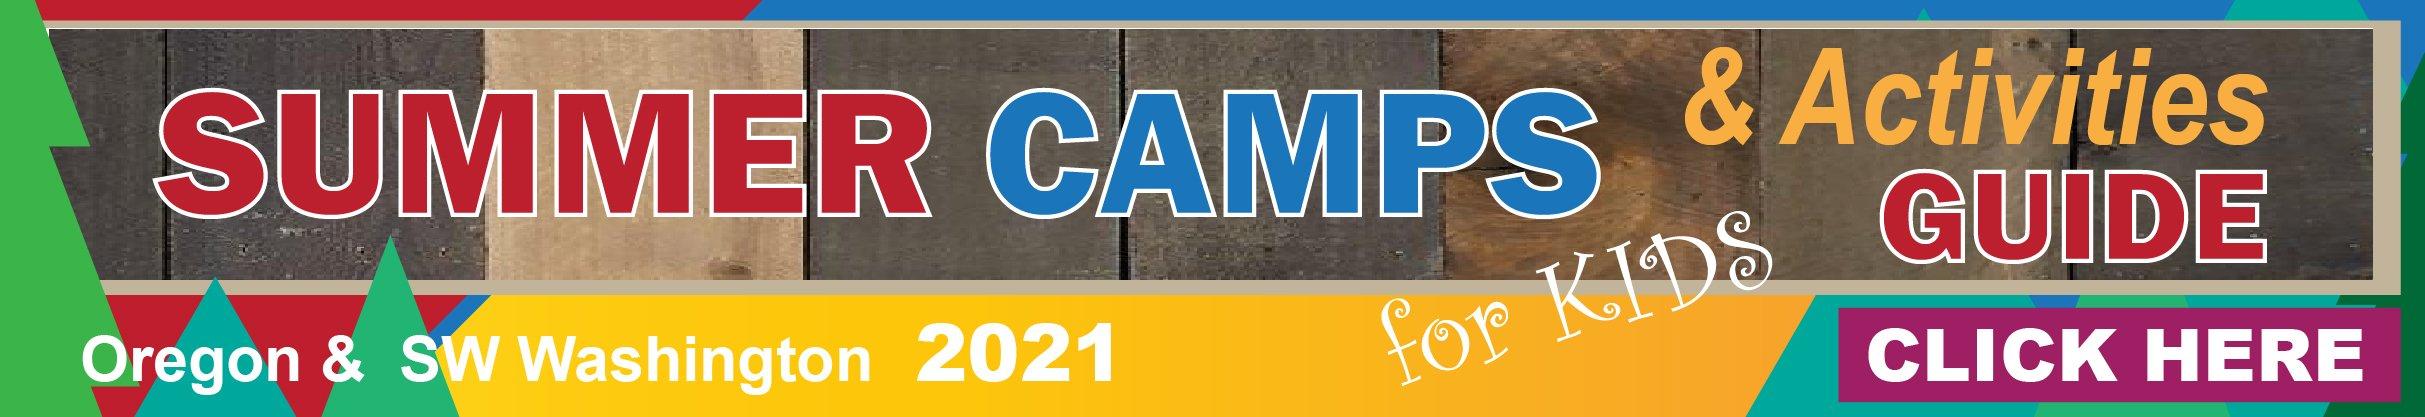 Summer Camps & Activities for kids 2021